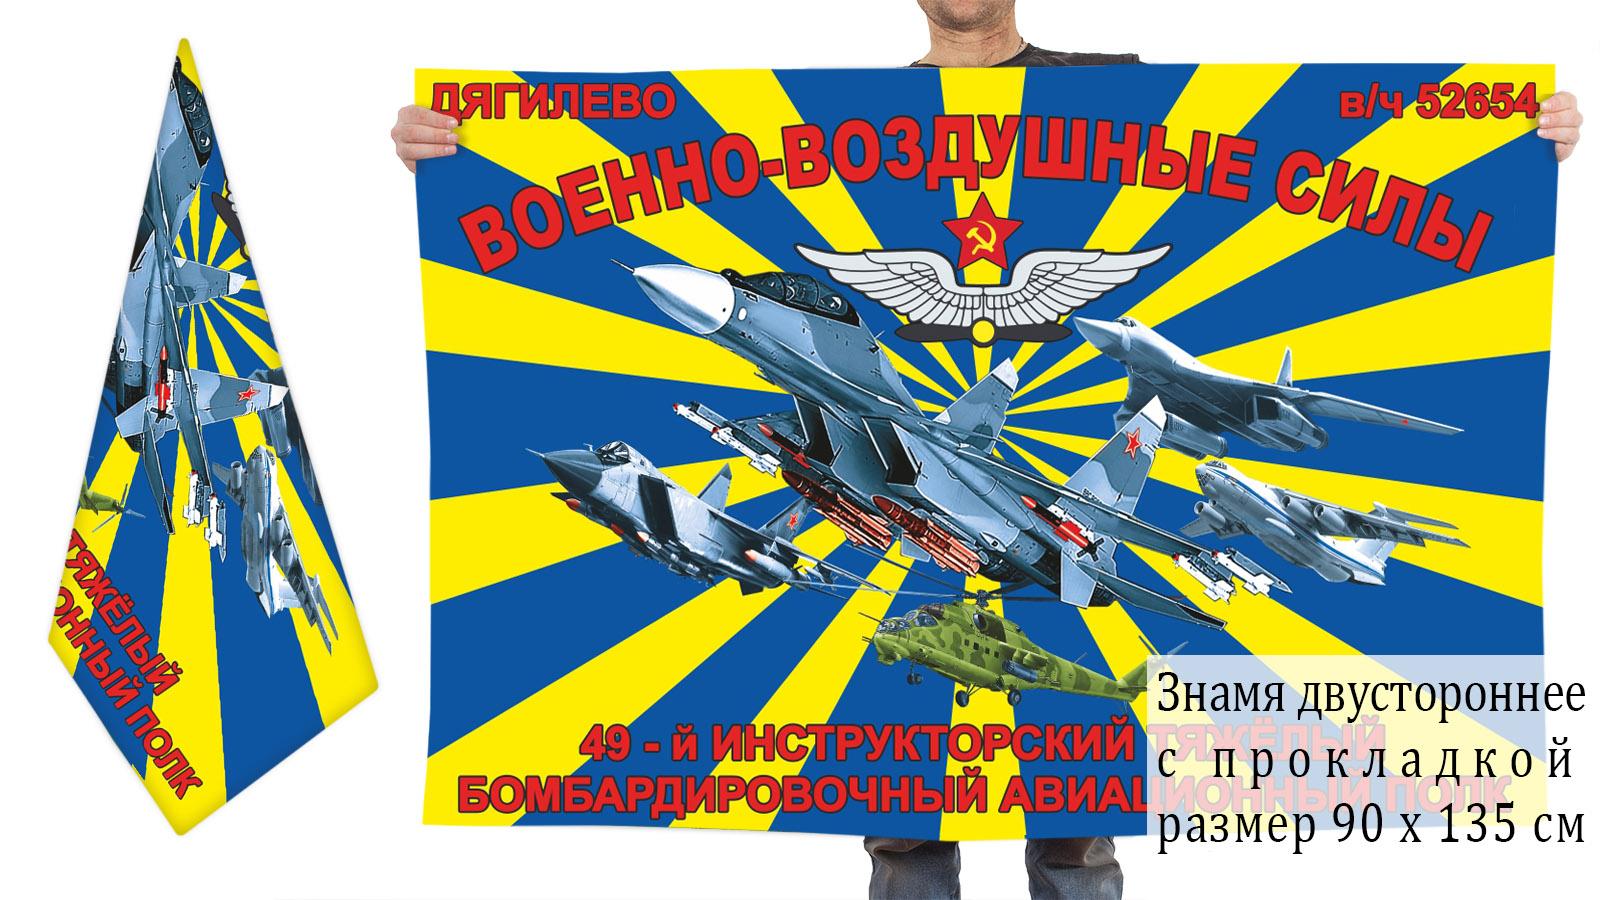 Двусторонний флаг 49 инструкторского тяжёлого бомбардировочного авиаполка